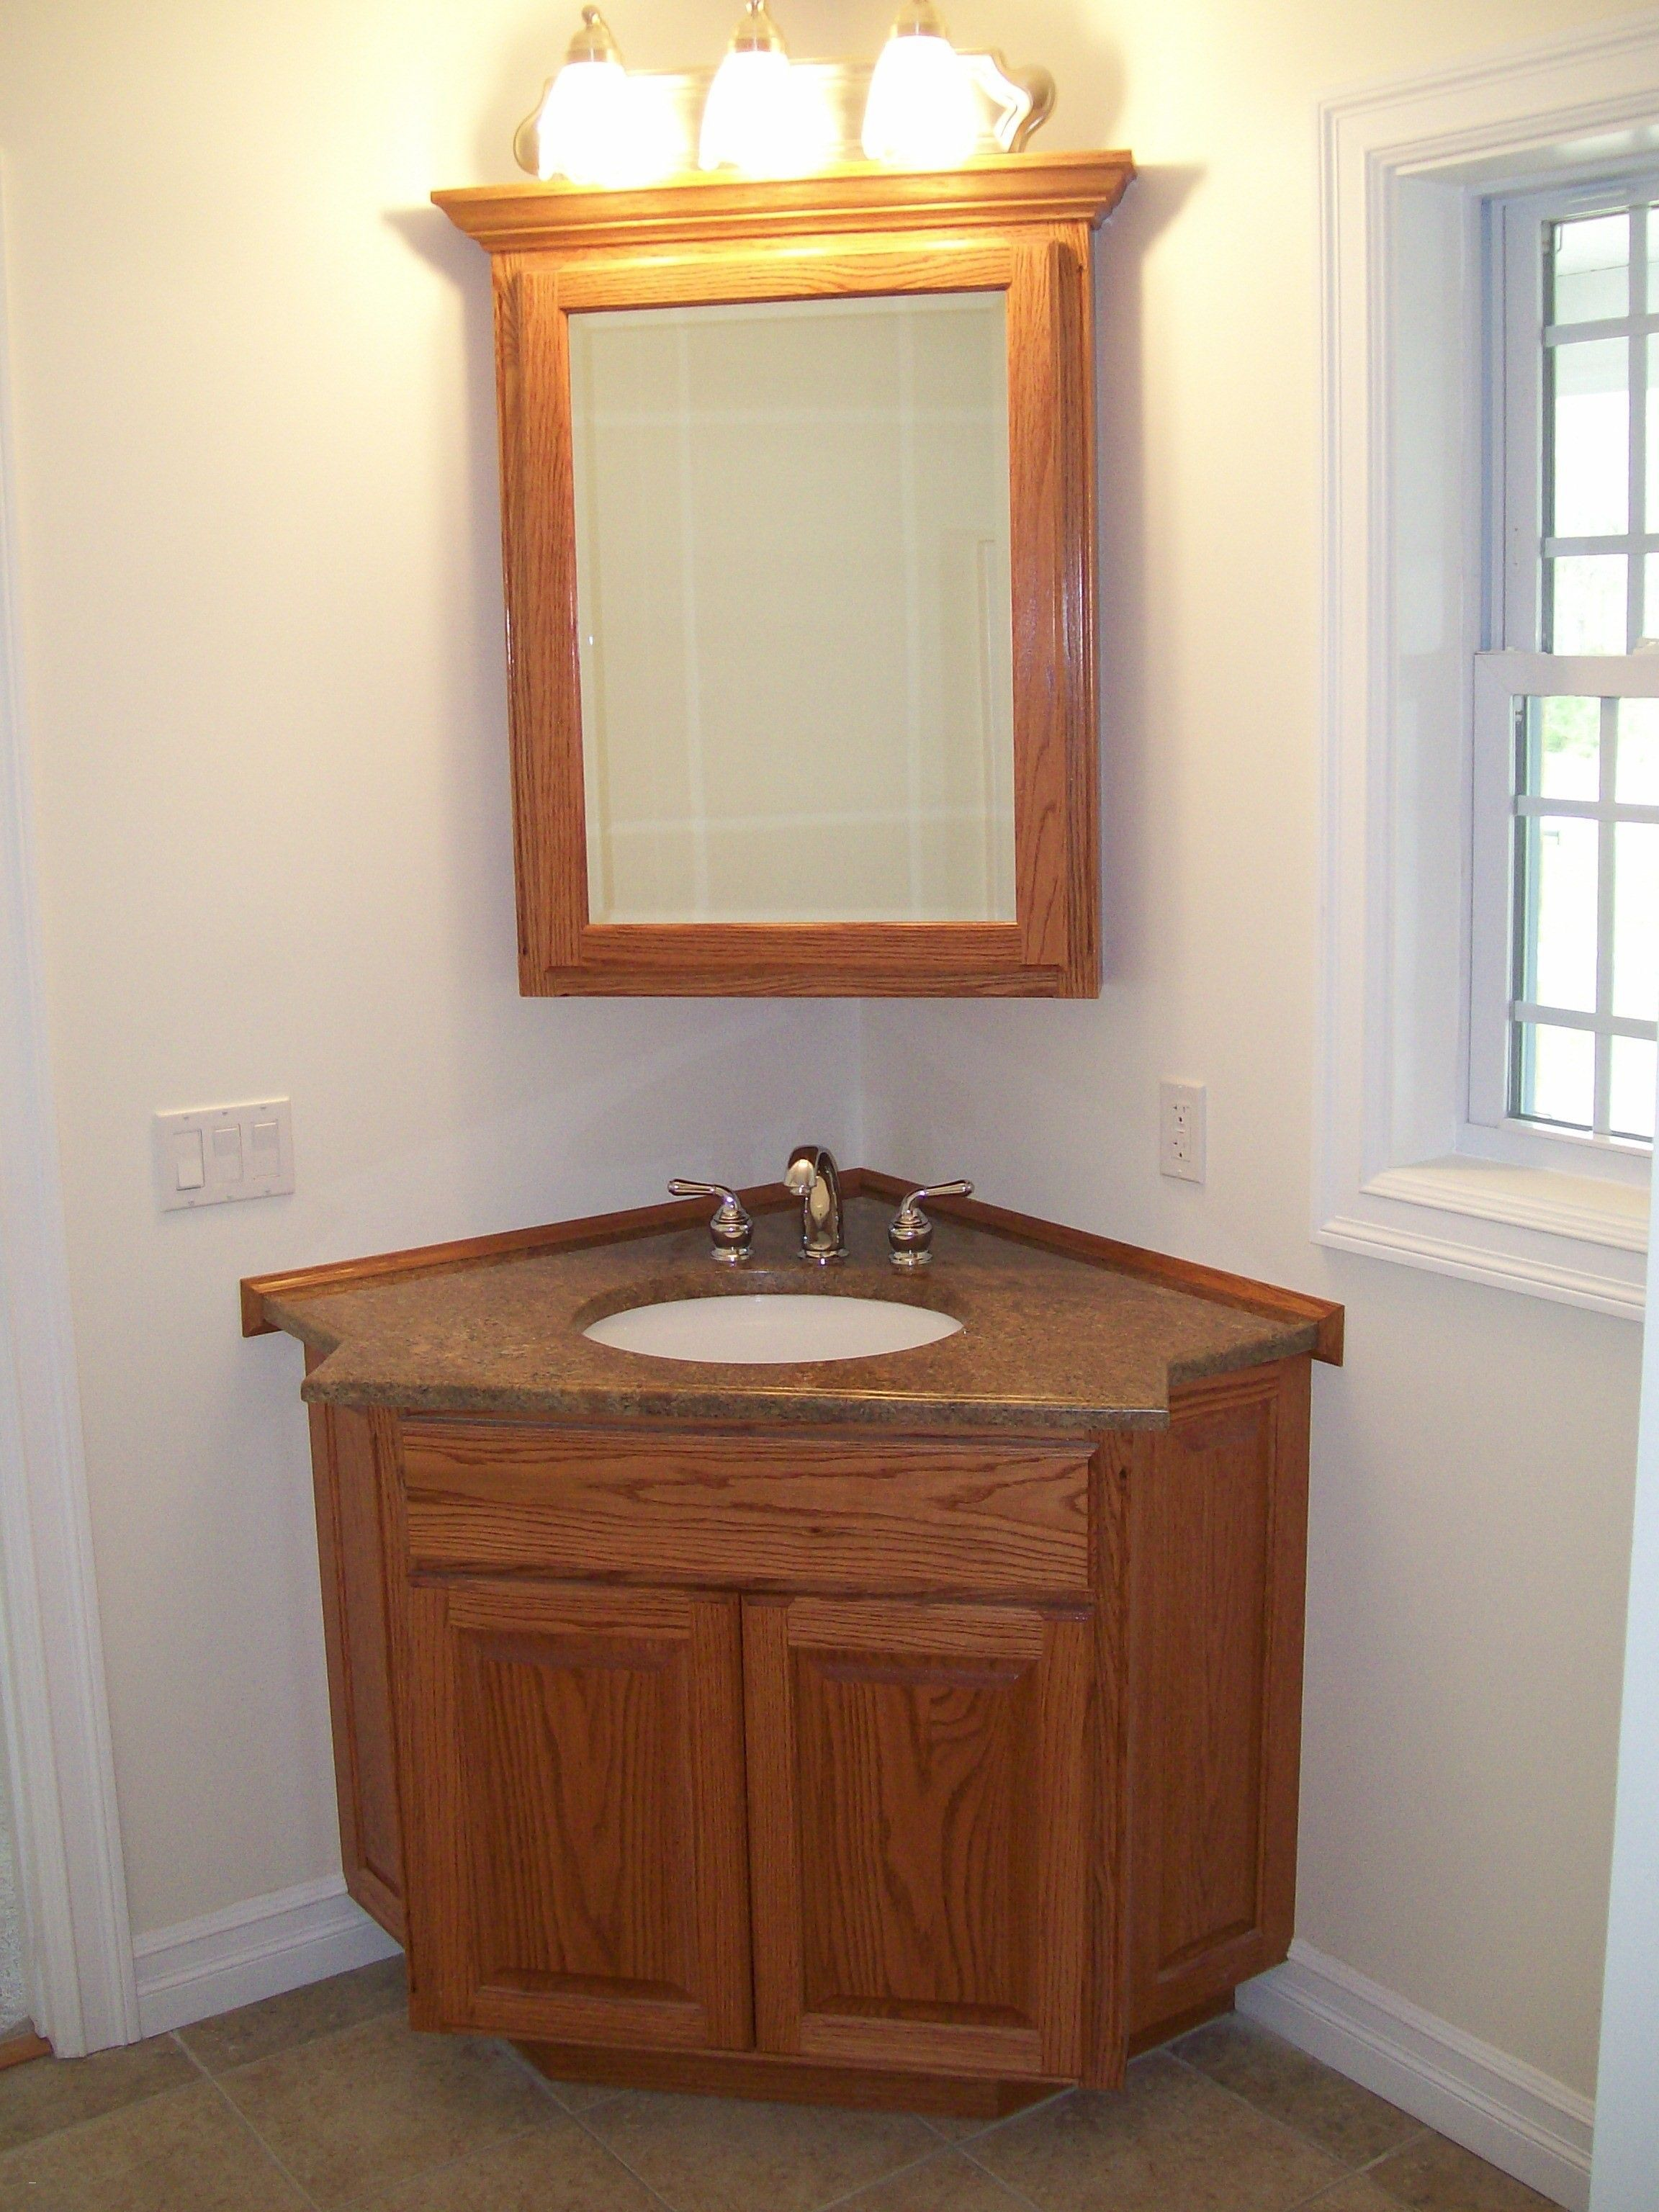 Bathroom Corner Mirror Cabinet Luxury Oak Bathroom Wall Cabinets Bathroomwallcabinets Small Bathroom Vanities Corner Sink Bathroom Bathroom Vanities For Sale